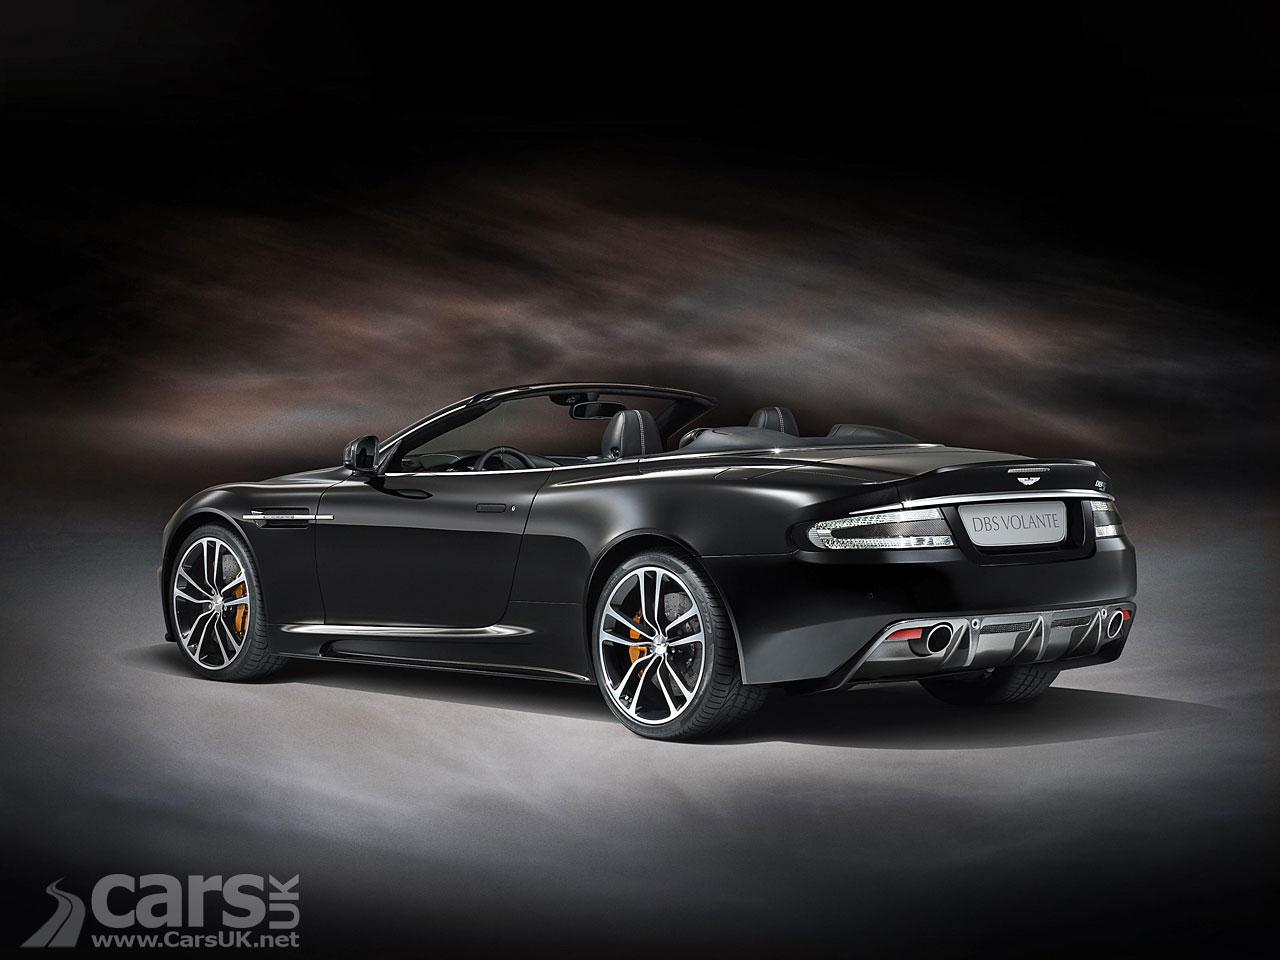 Aston Martin DBS Carbon Edition 2012 (1)